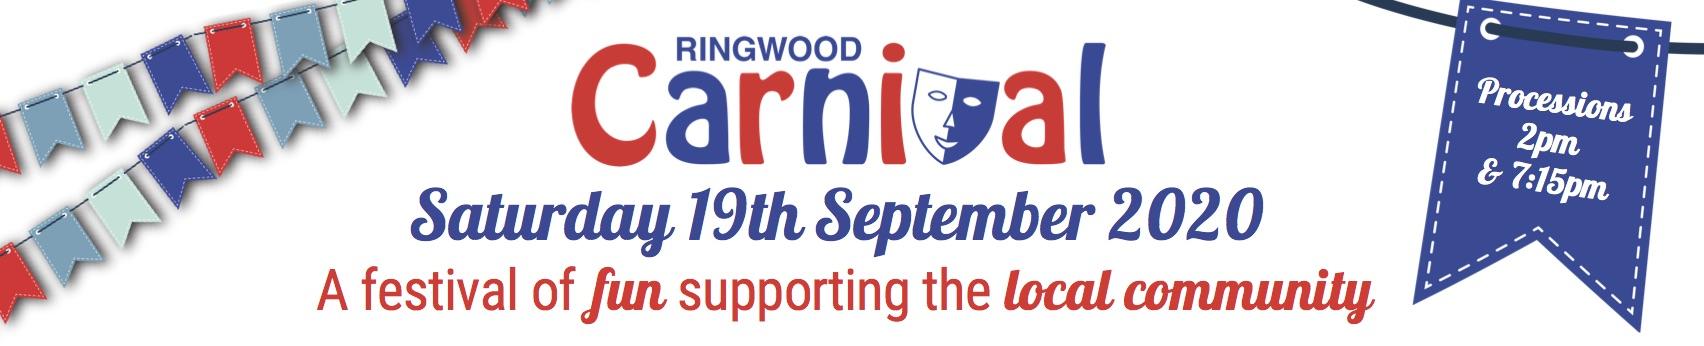 Ringwood Carnival 2020 date